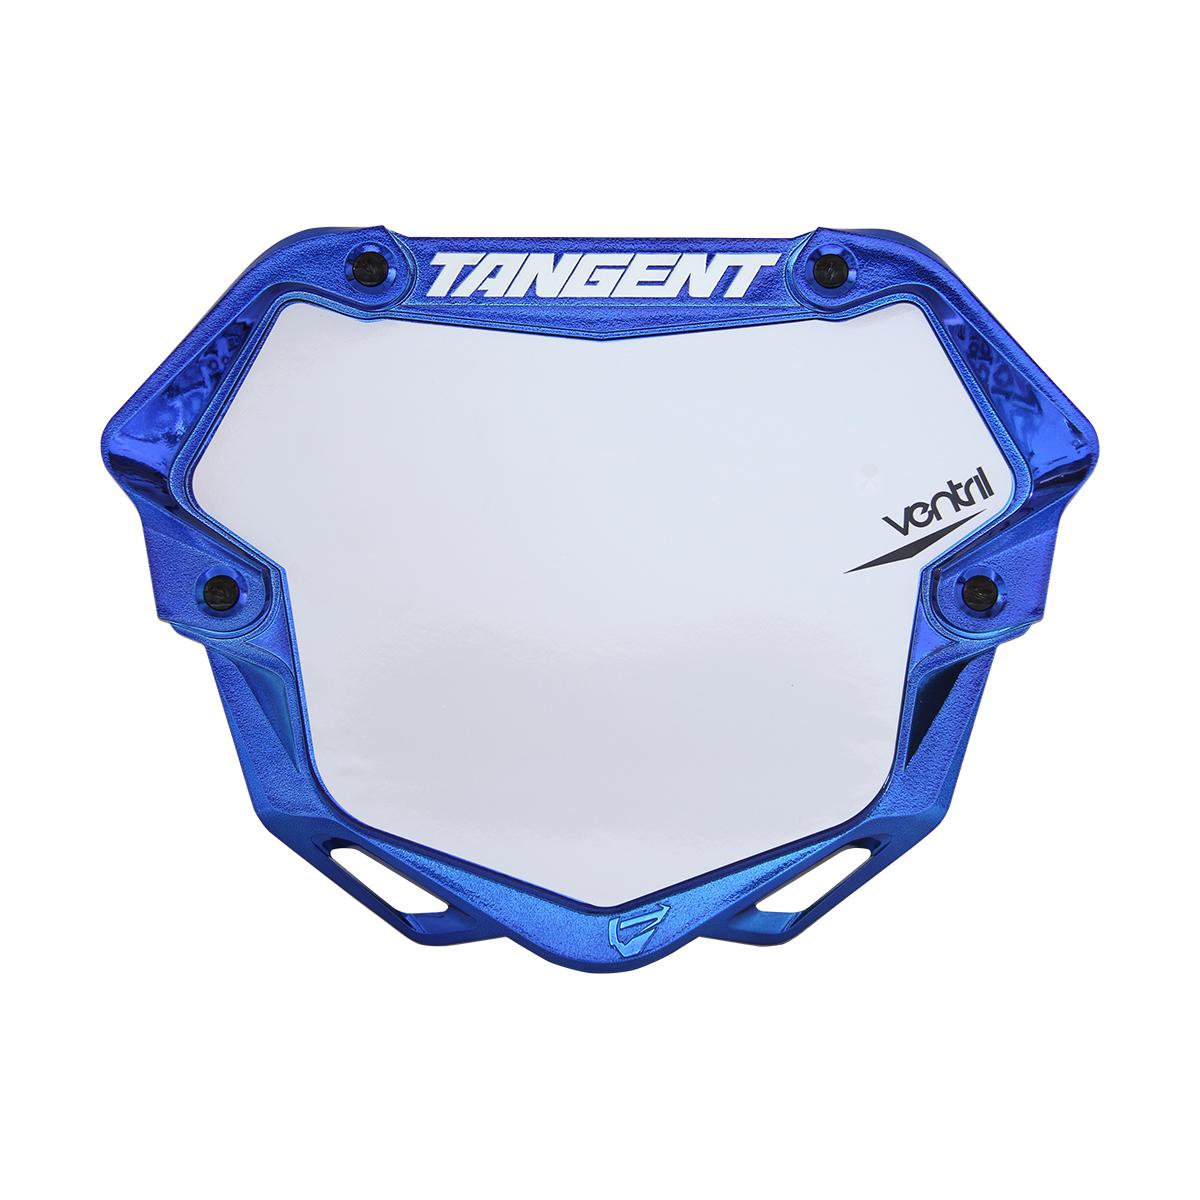 TANGENT VENTRIL 3D PRO NUMBER PLATES